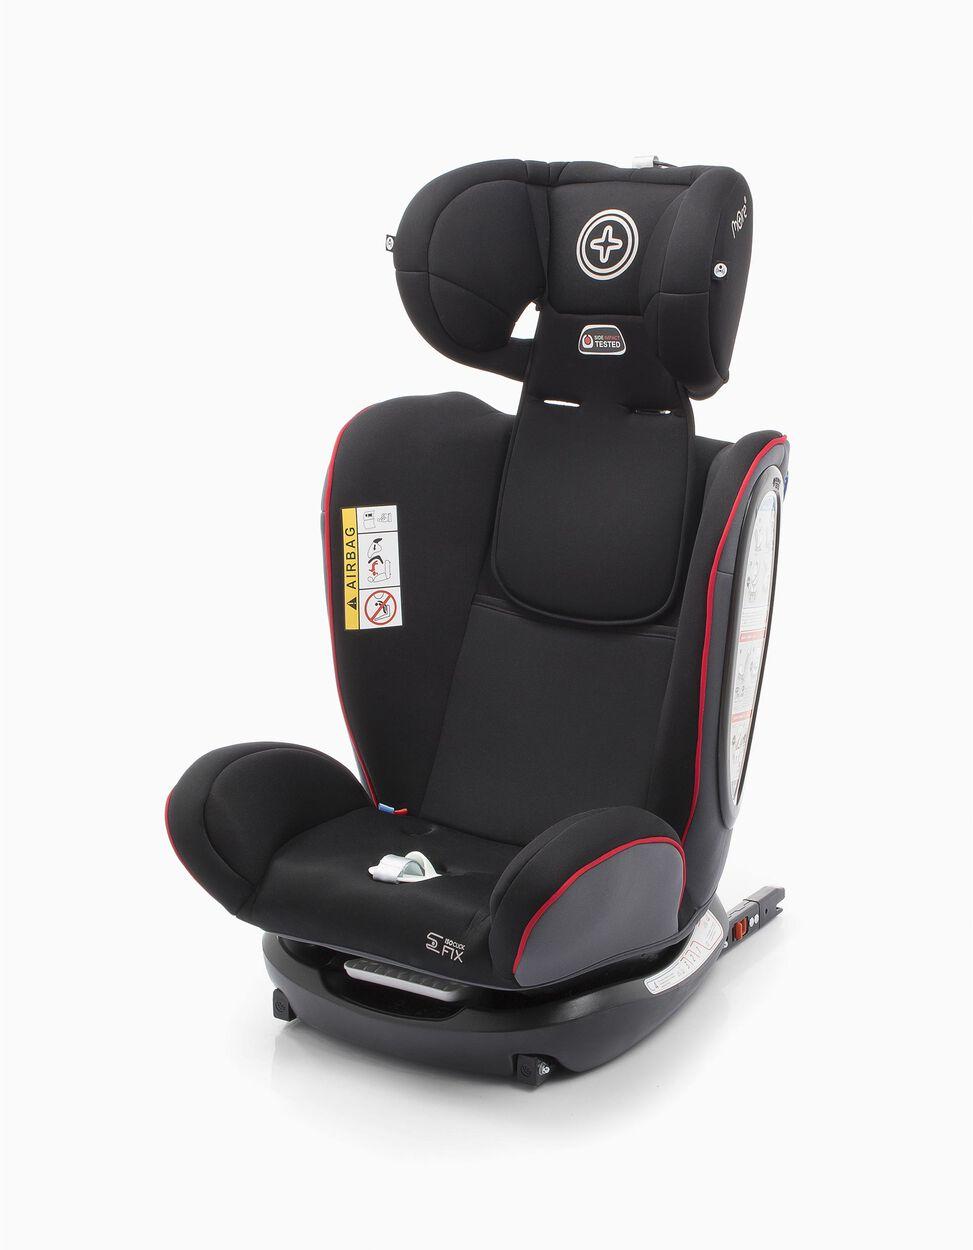 Cadeira Auto Gr 0/1/2/3 All Werdu More